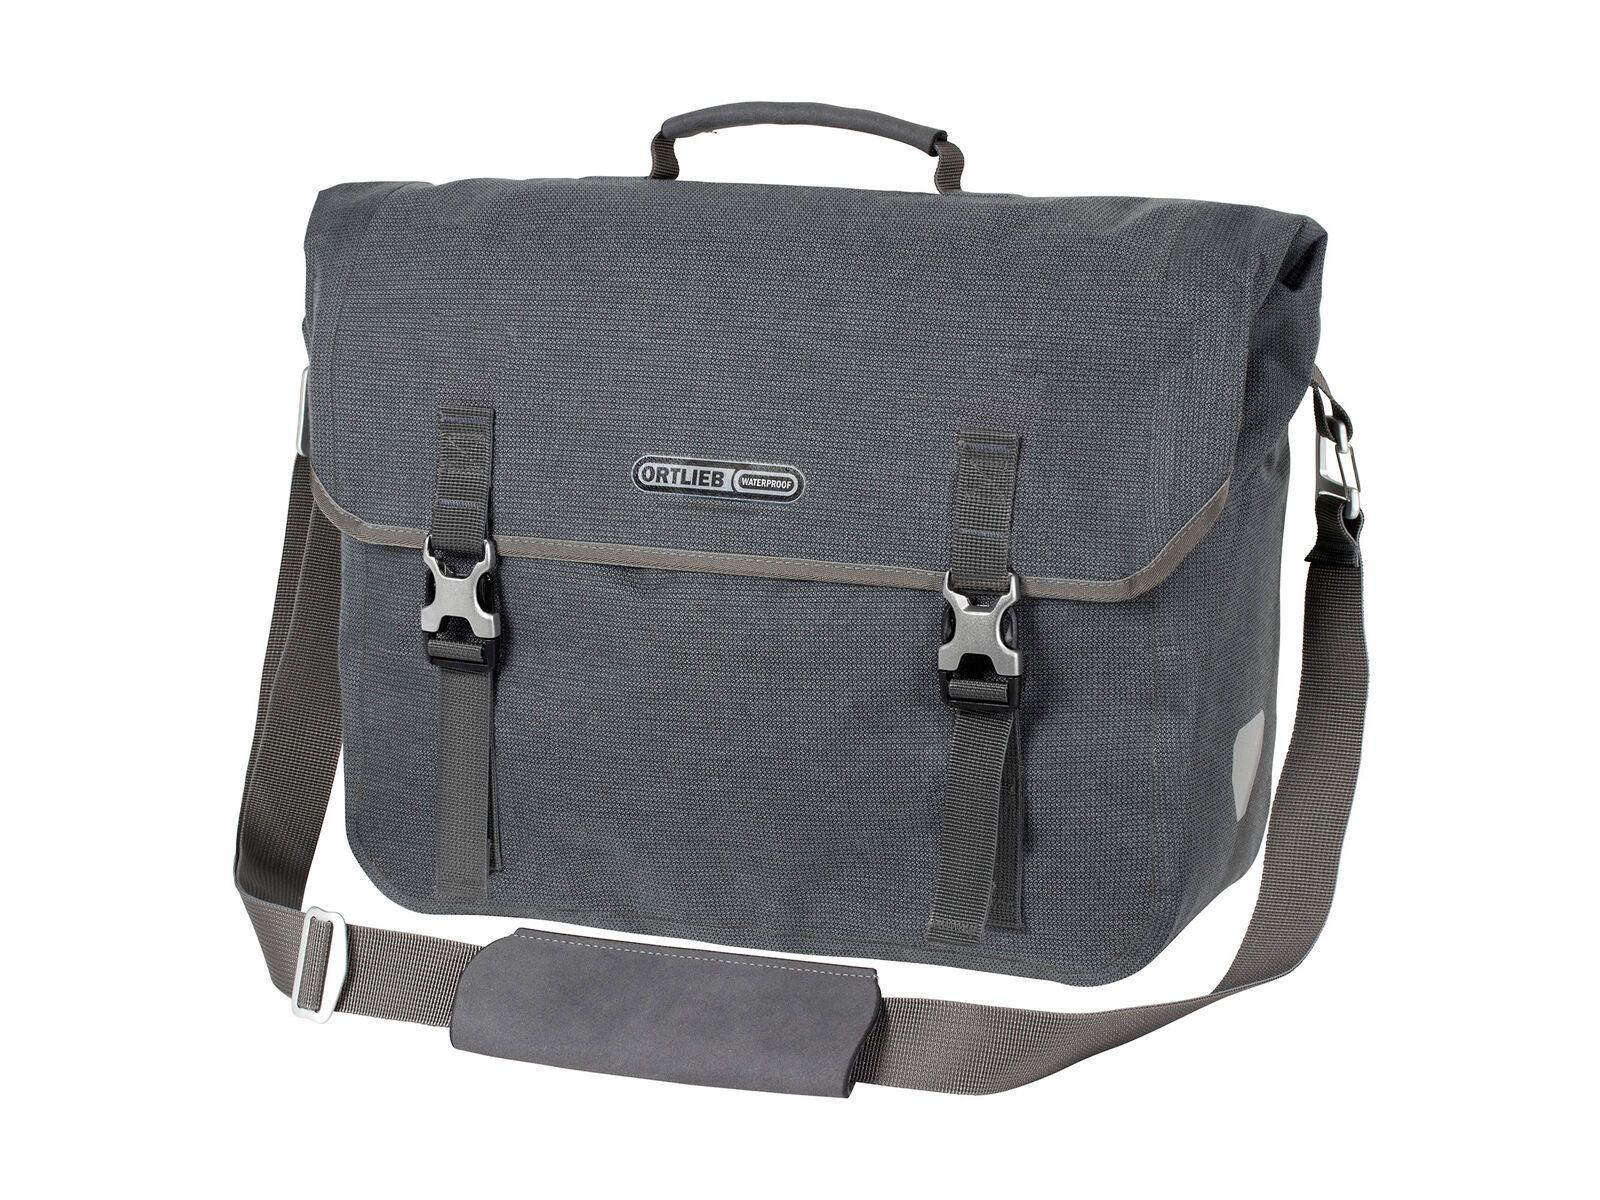 Ortlieb Commuter-Bag Two Urban QL3.1, pepper - Fahrradtasche F70661